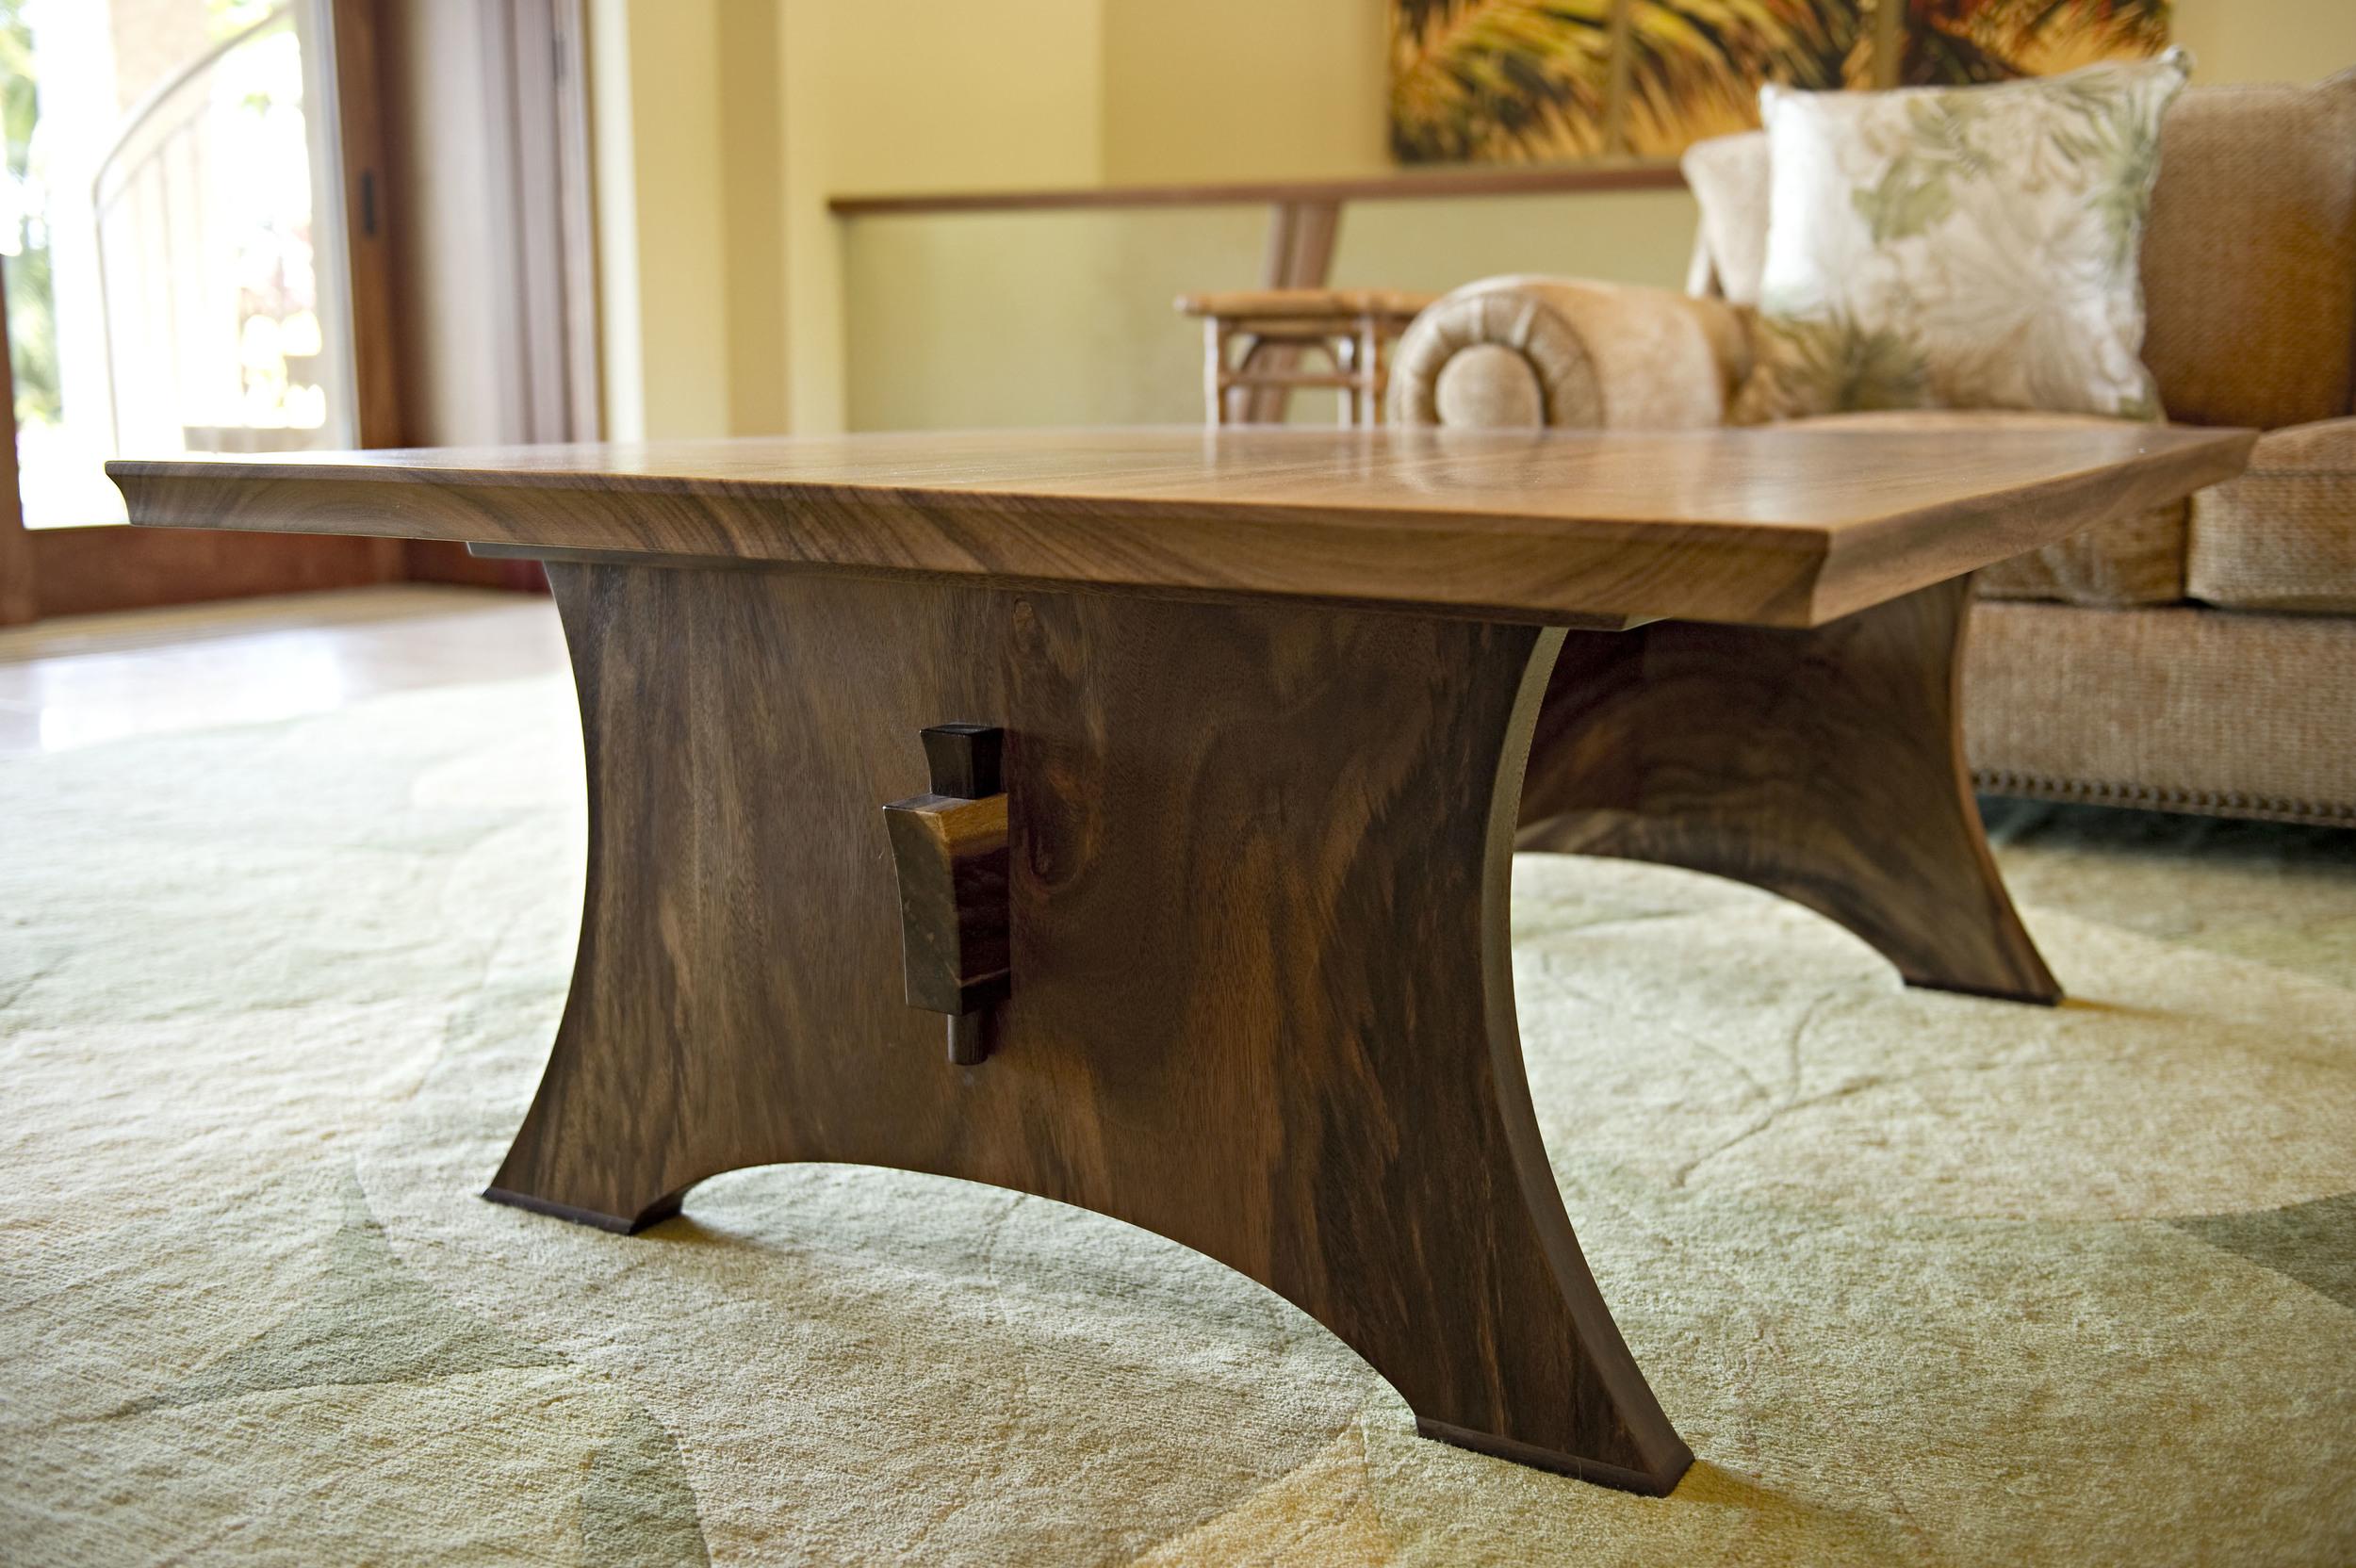 Monkey Pod Coffe Table